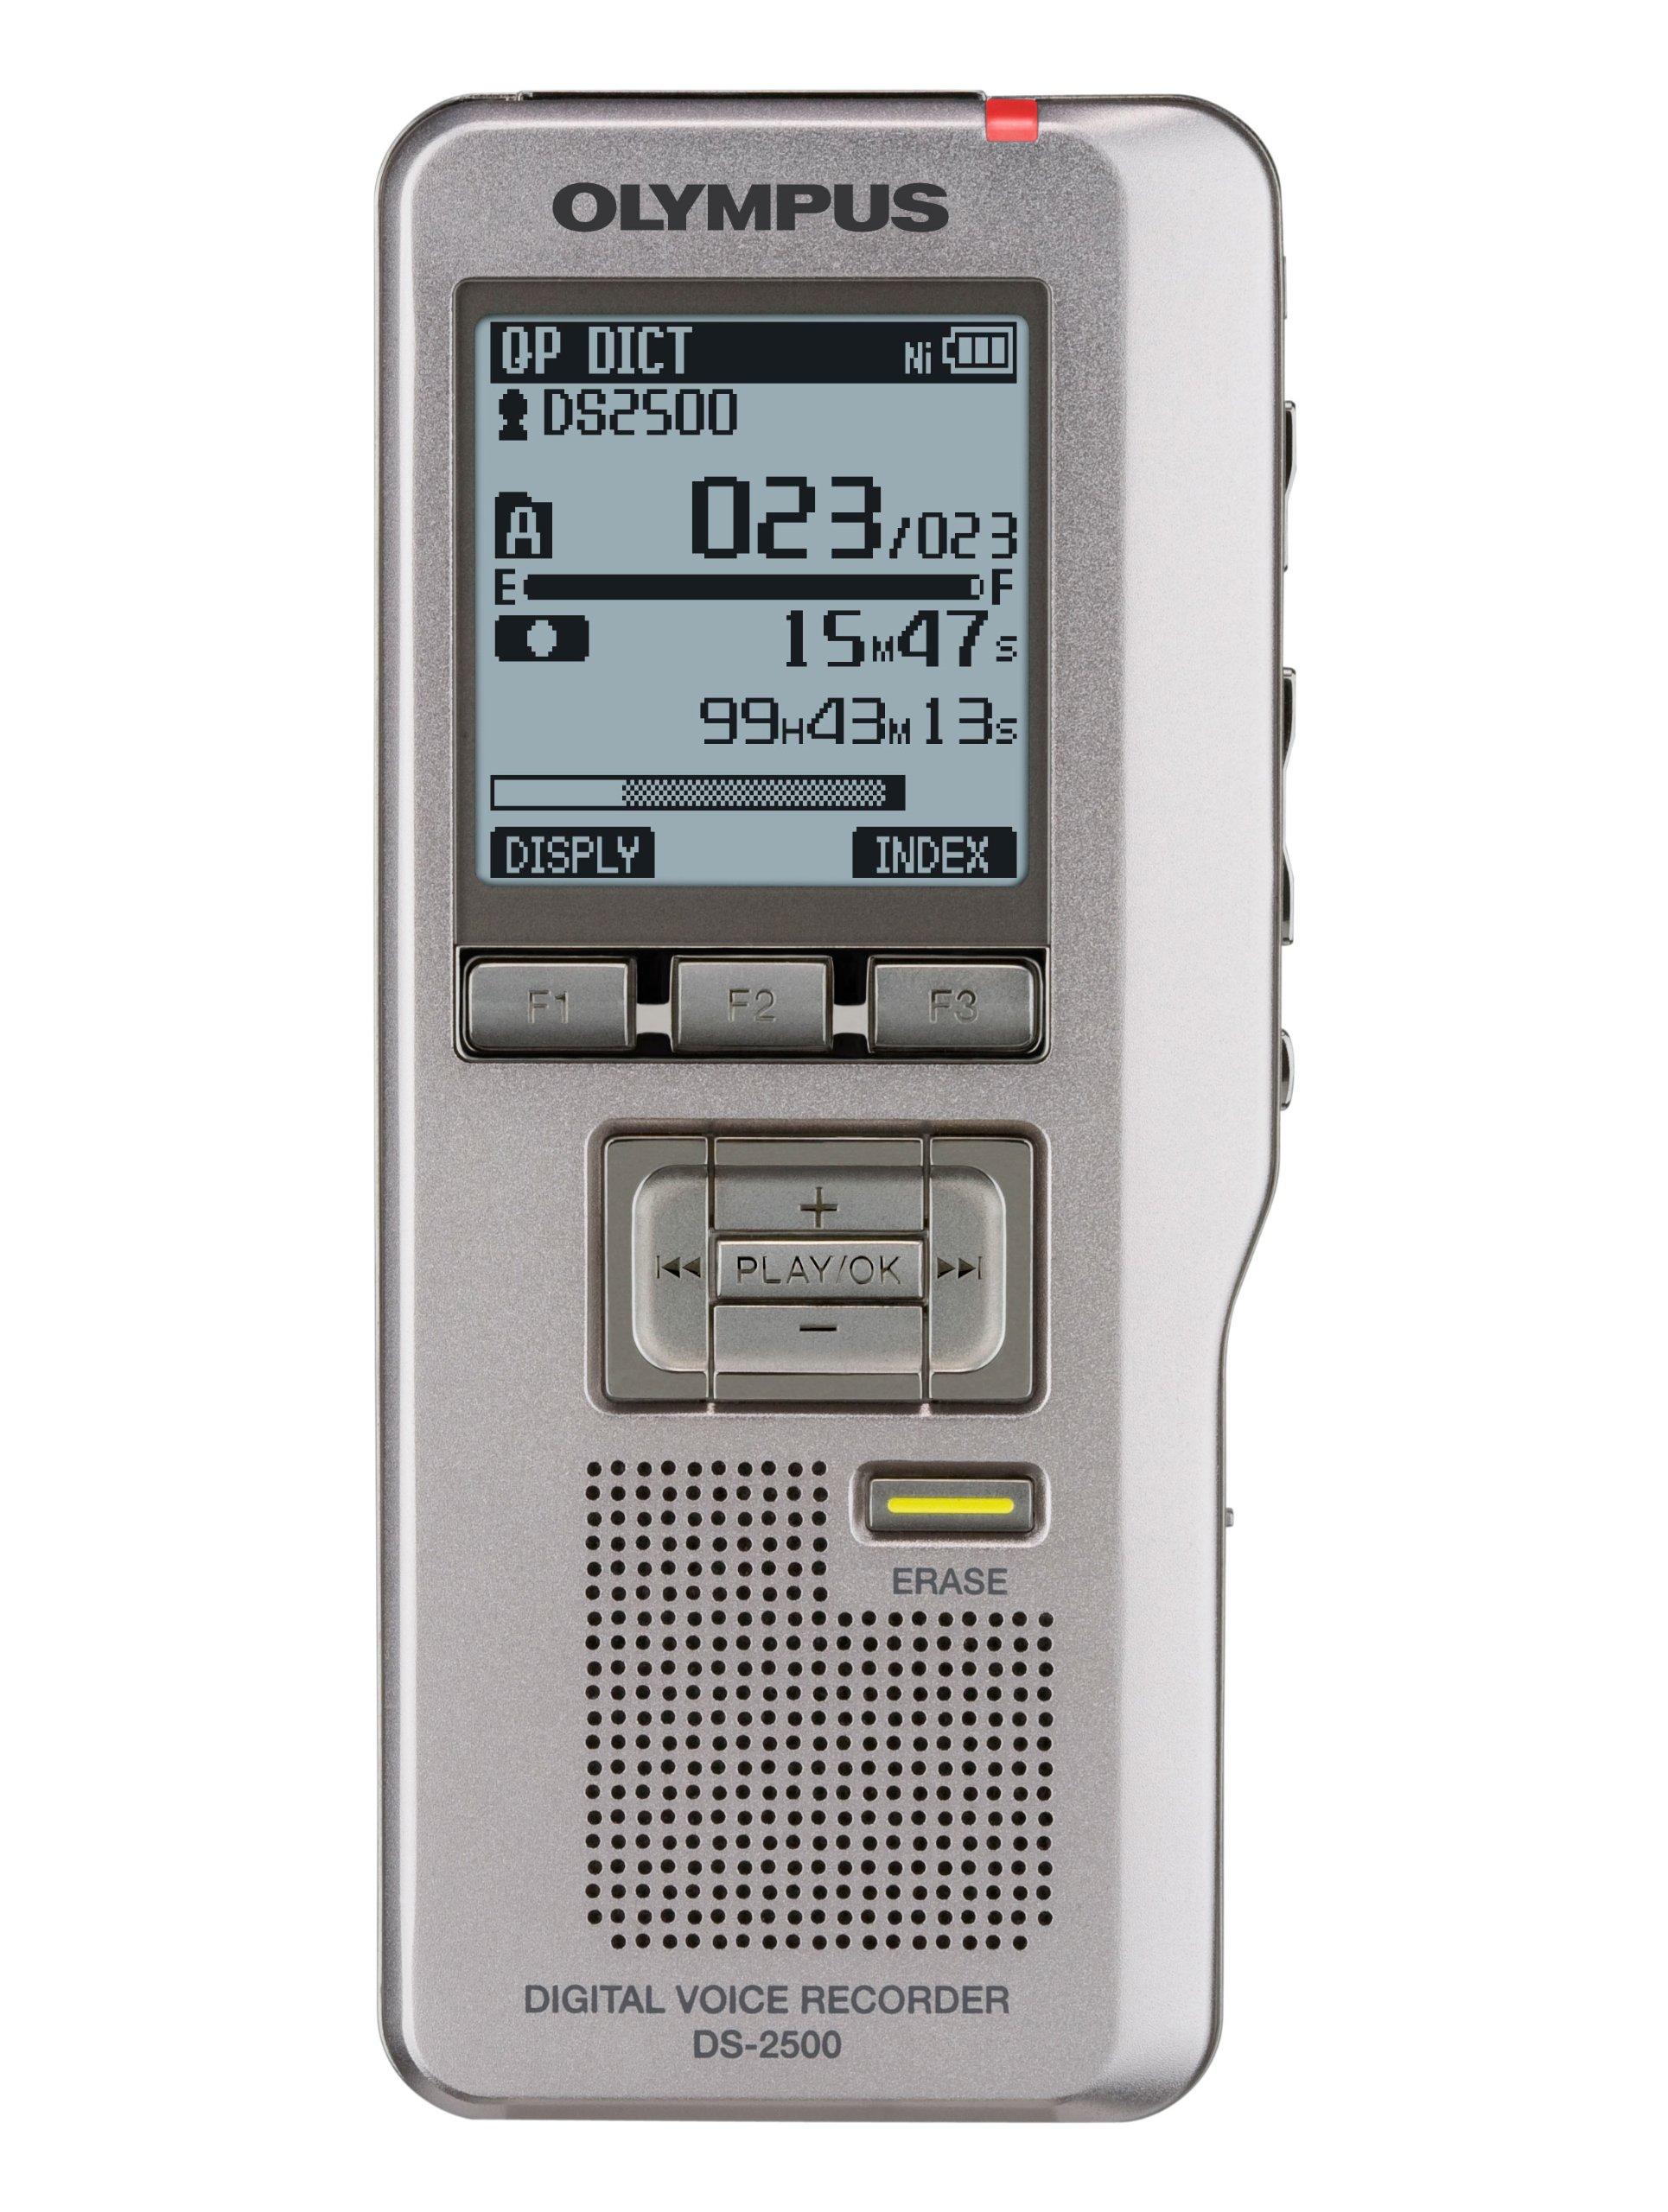 Olympus DS-2500 Digital Voice Recorder